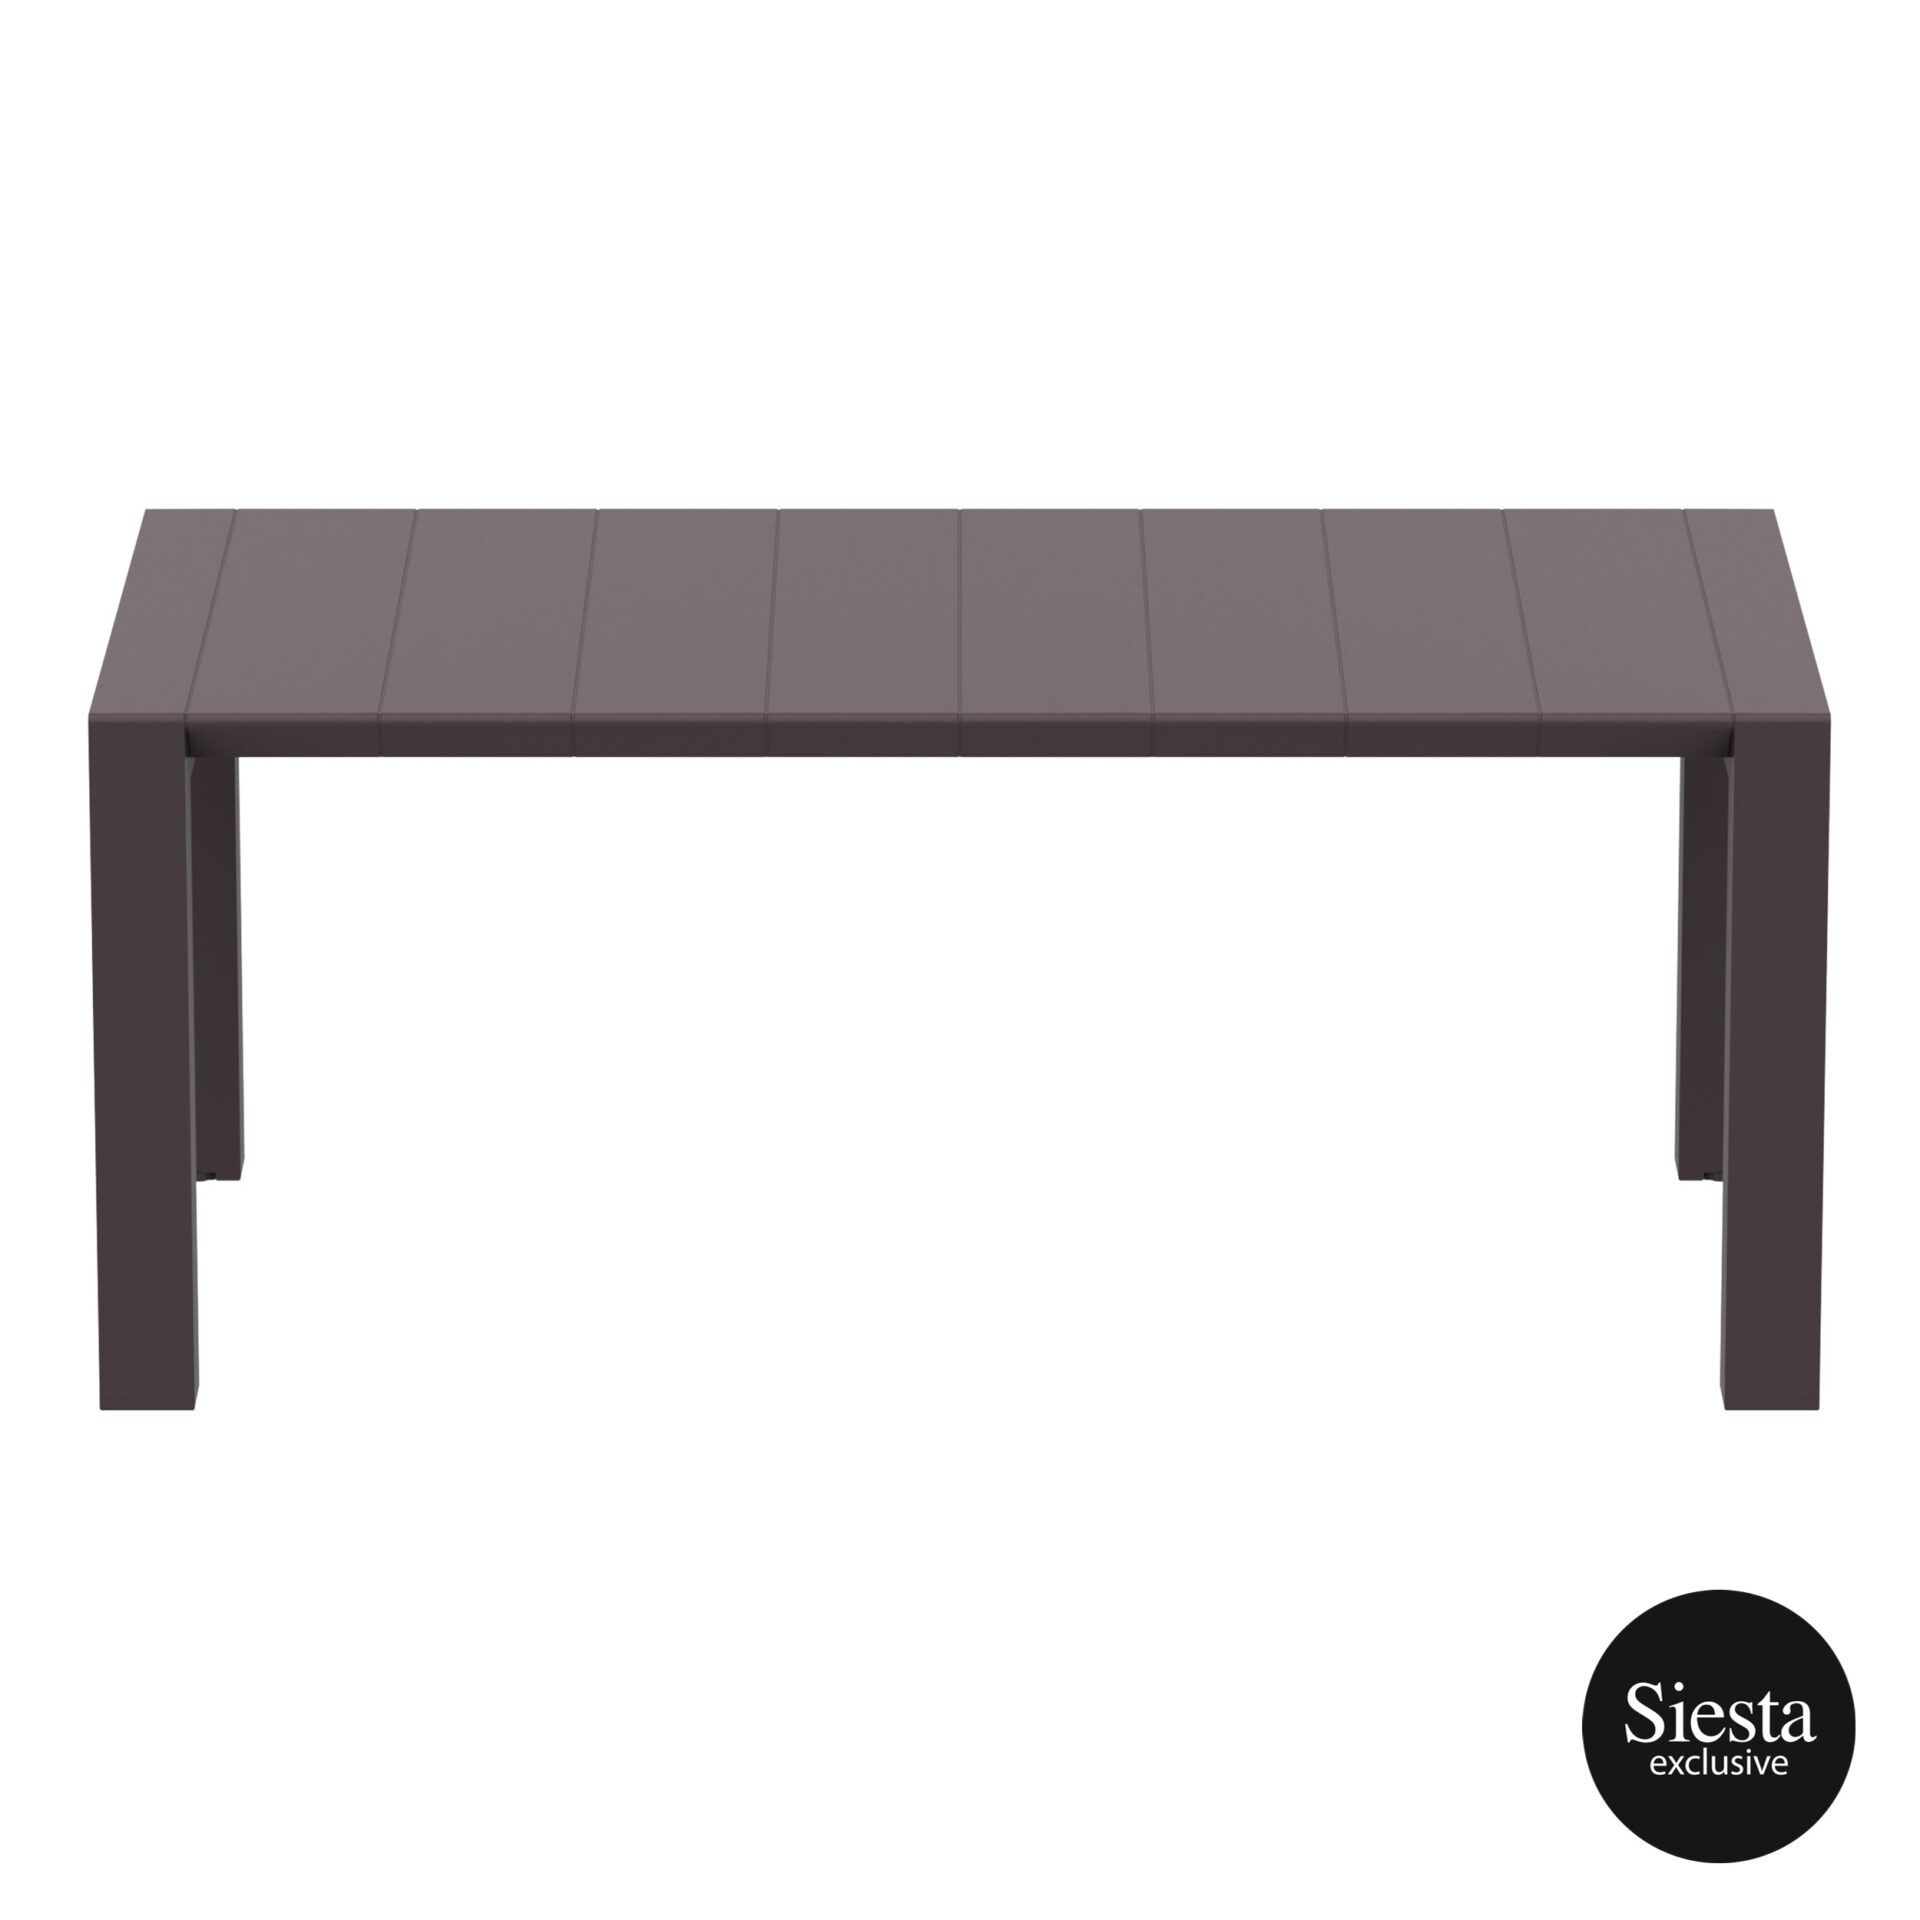 008 vegas medium table 180 rattan brown long edge